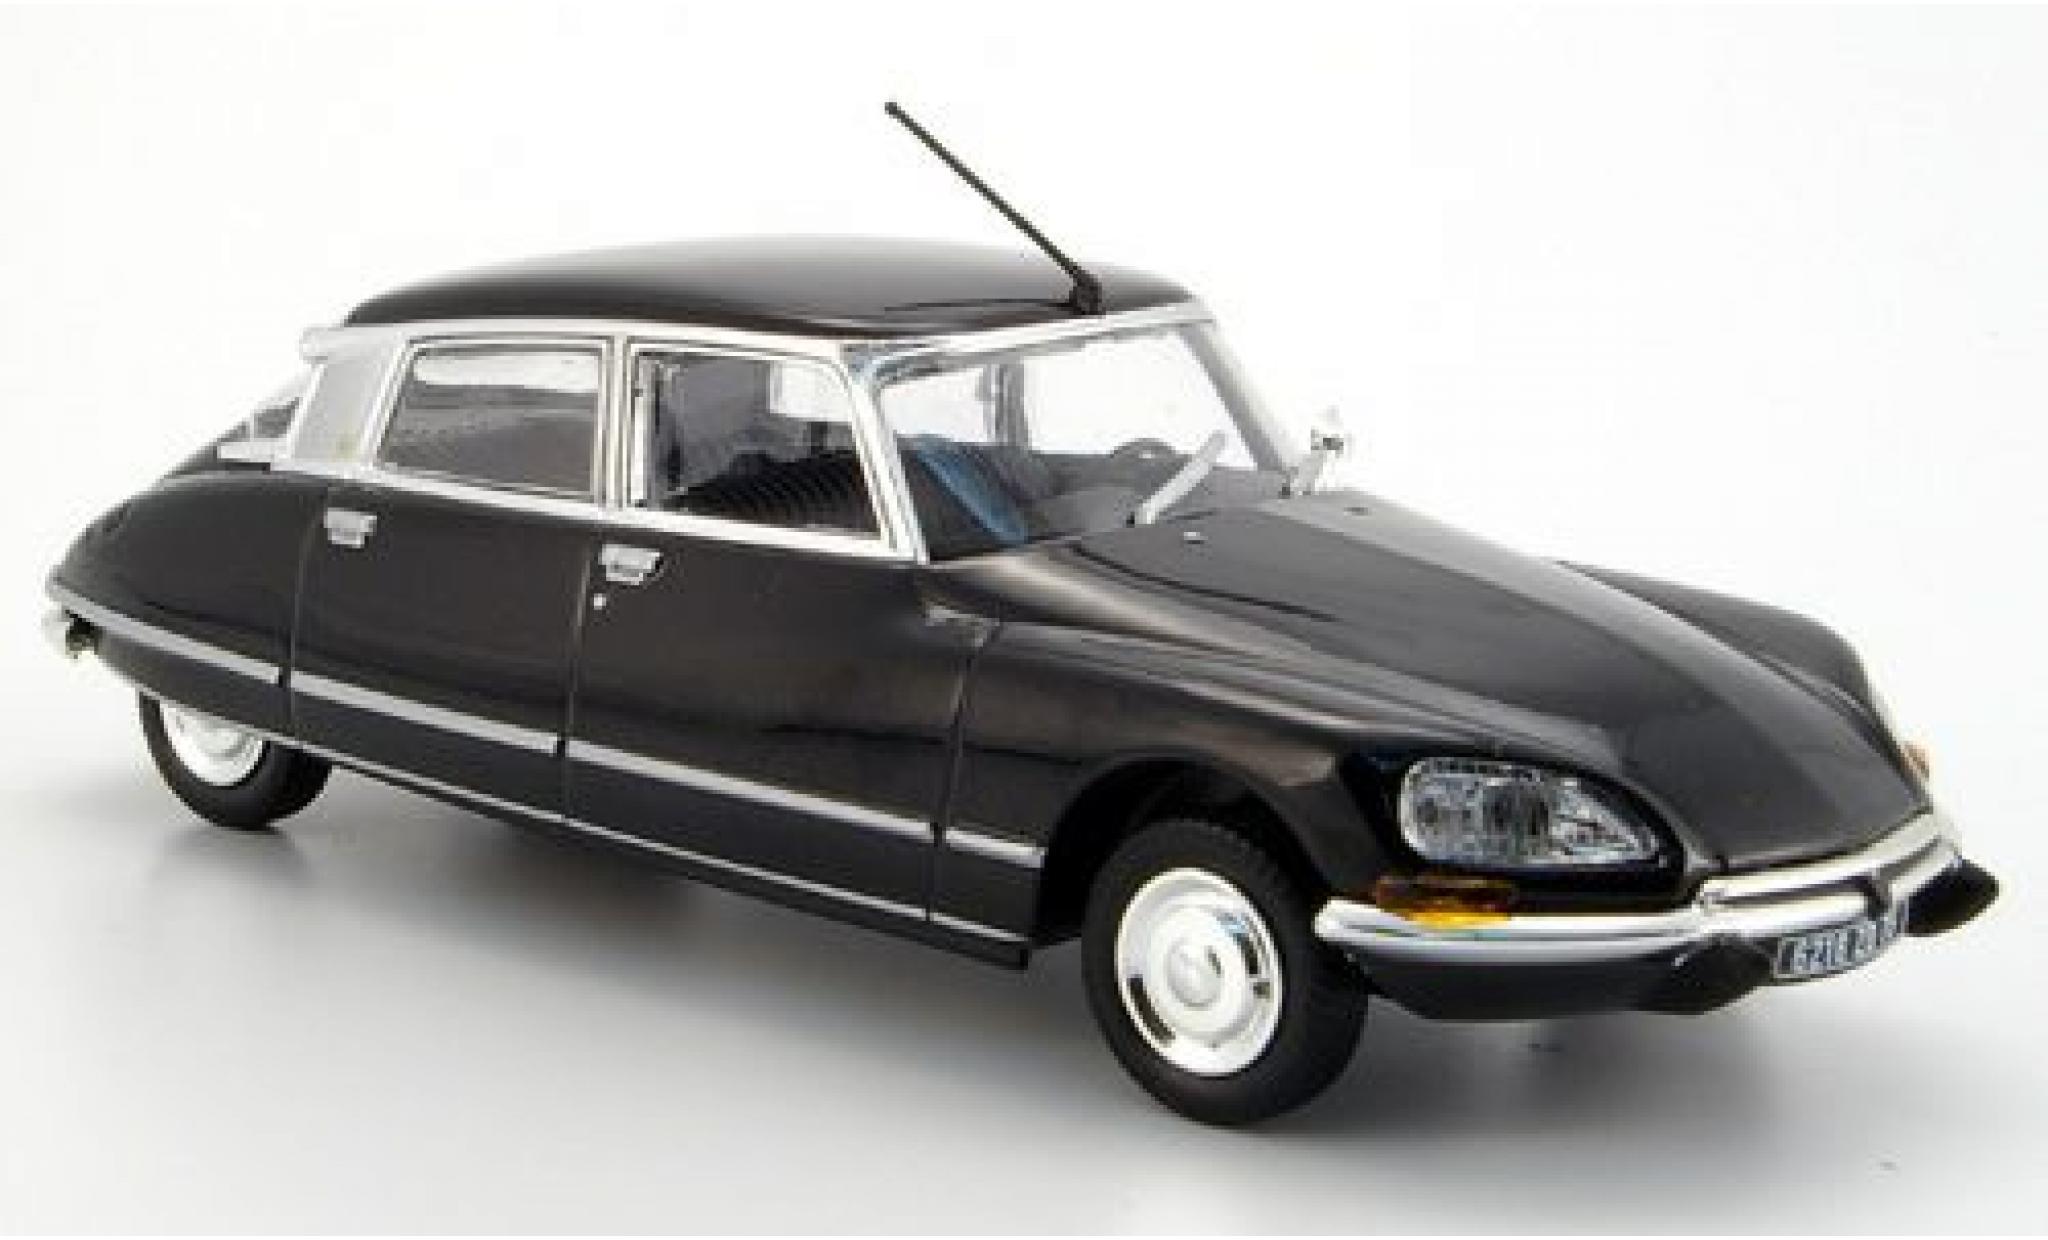 Citroen DS 1/43 SpecialC 56 23 noire Valery Giscard d Estaing 1974 sans Vitrine